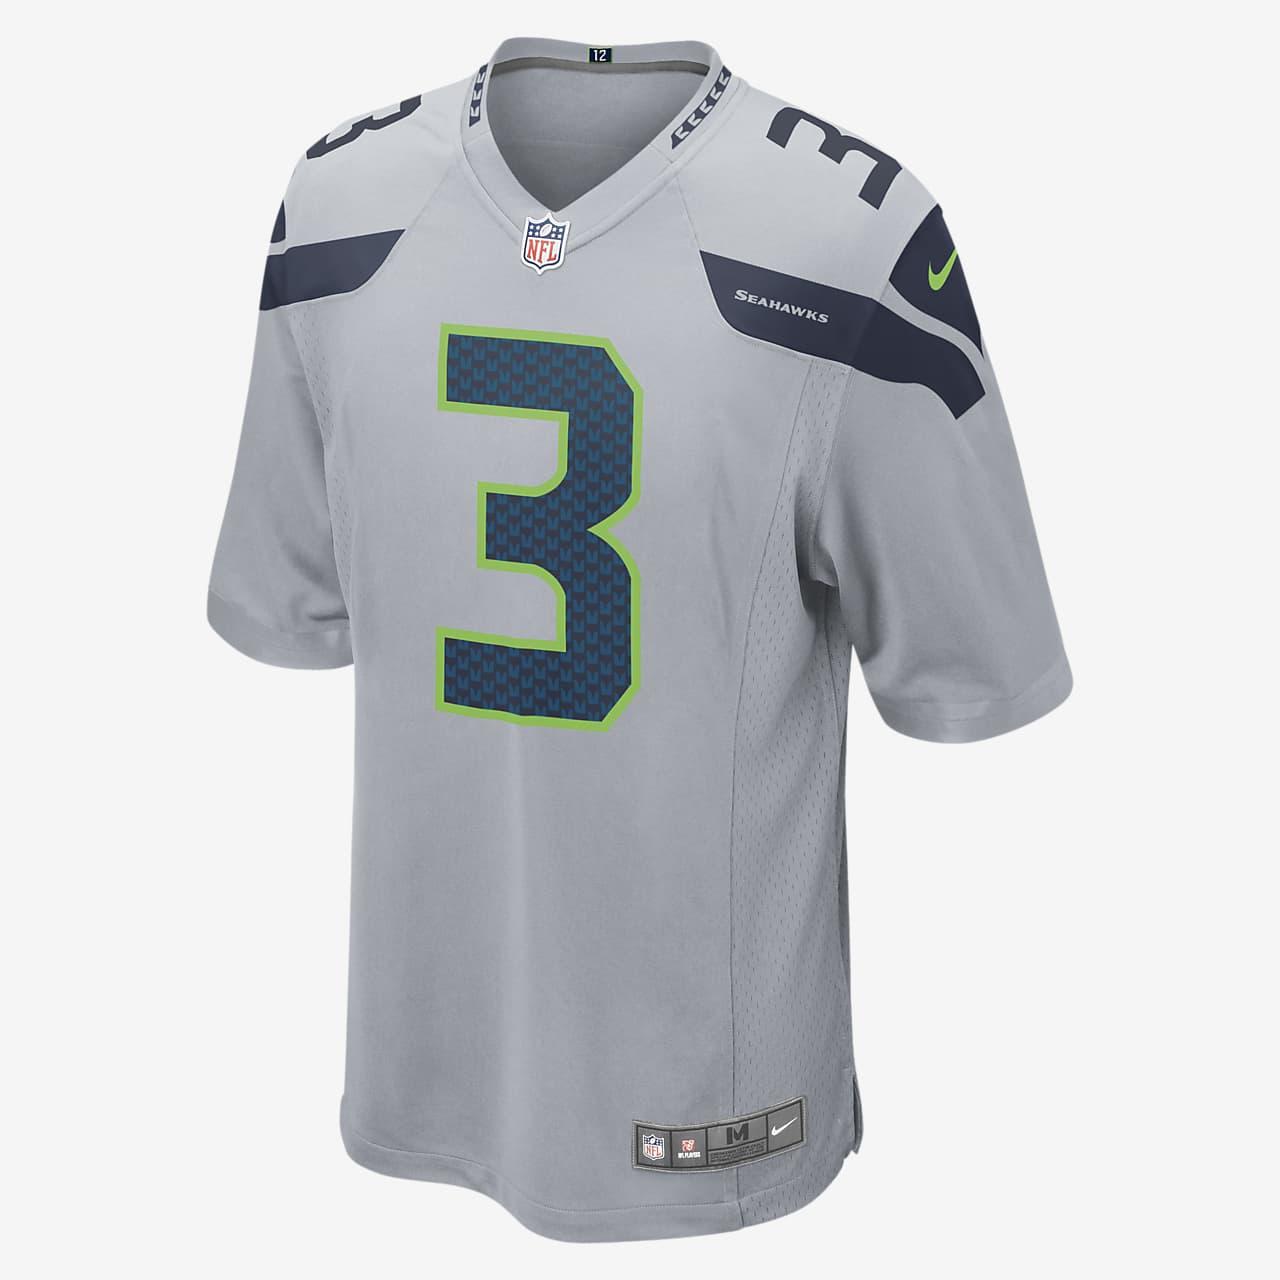 NFL Seattle Seahawks (Russell Wilson) Men's Game Football Jersey